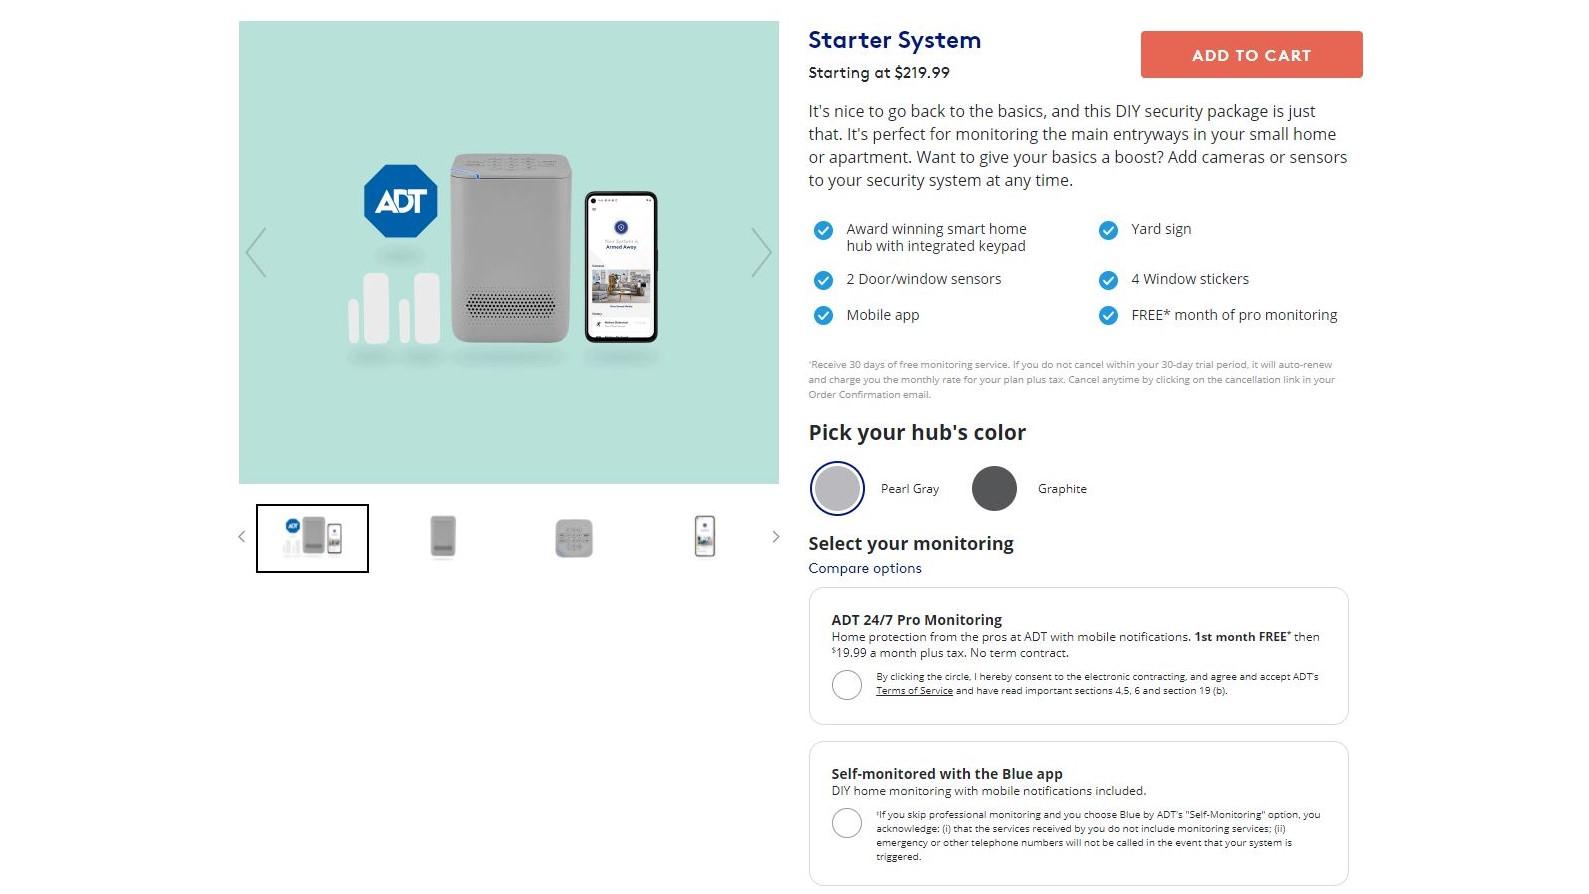 Starter System